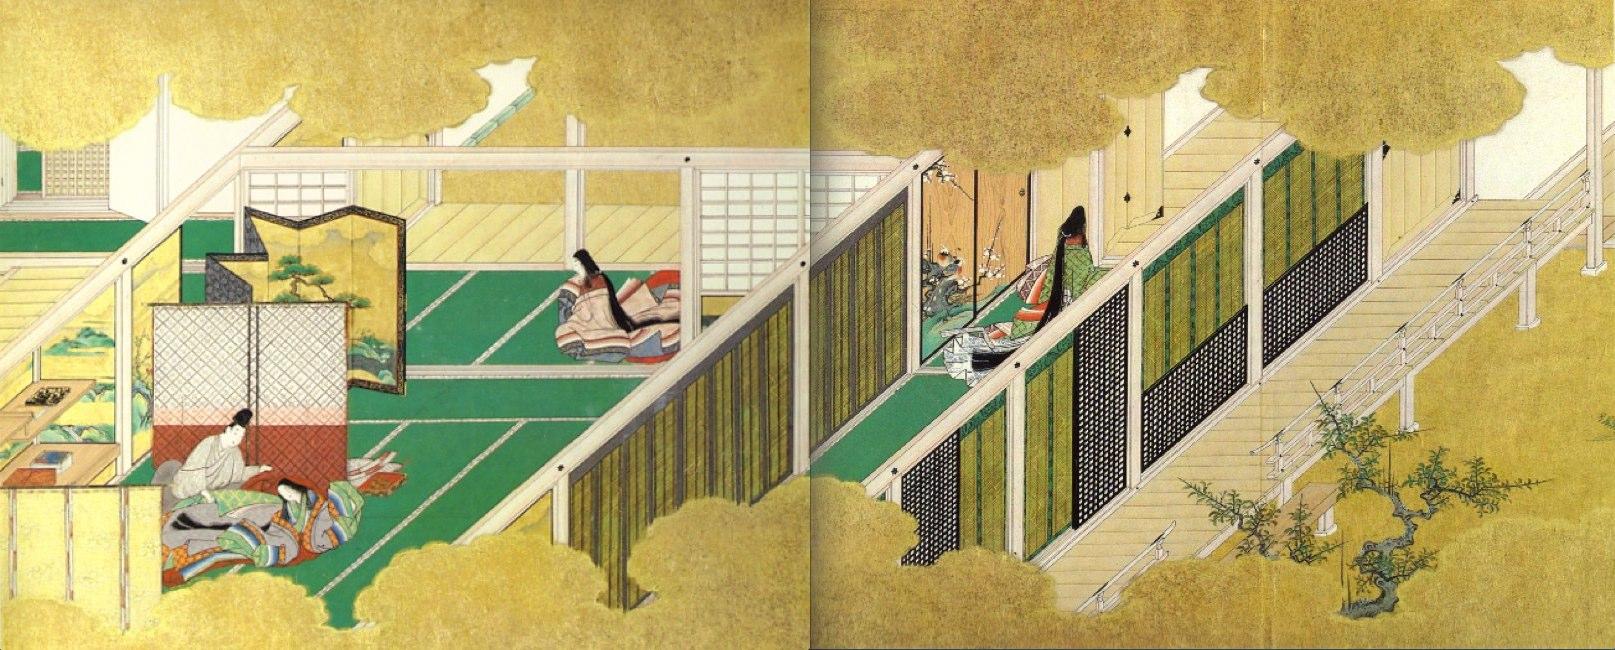 what women the tale of genji